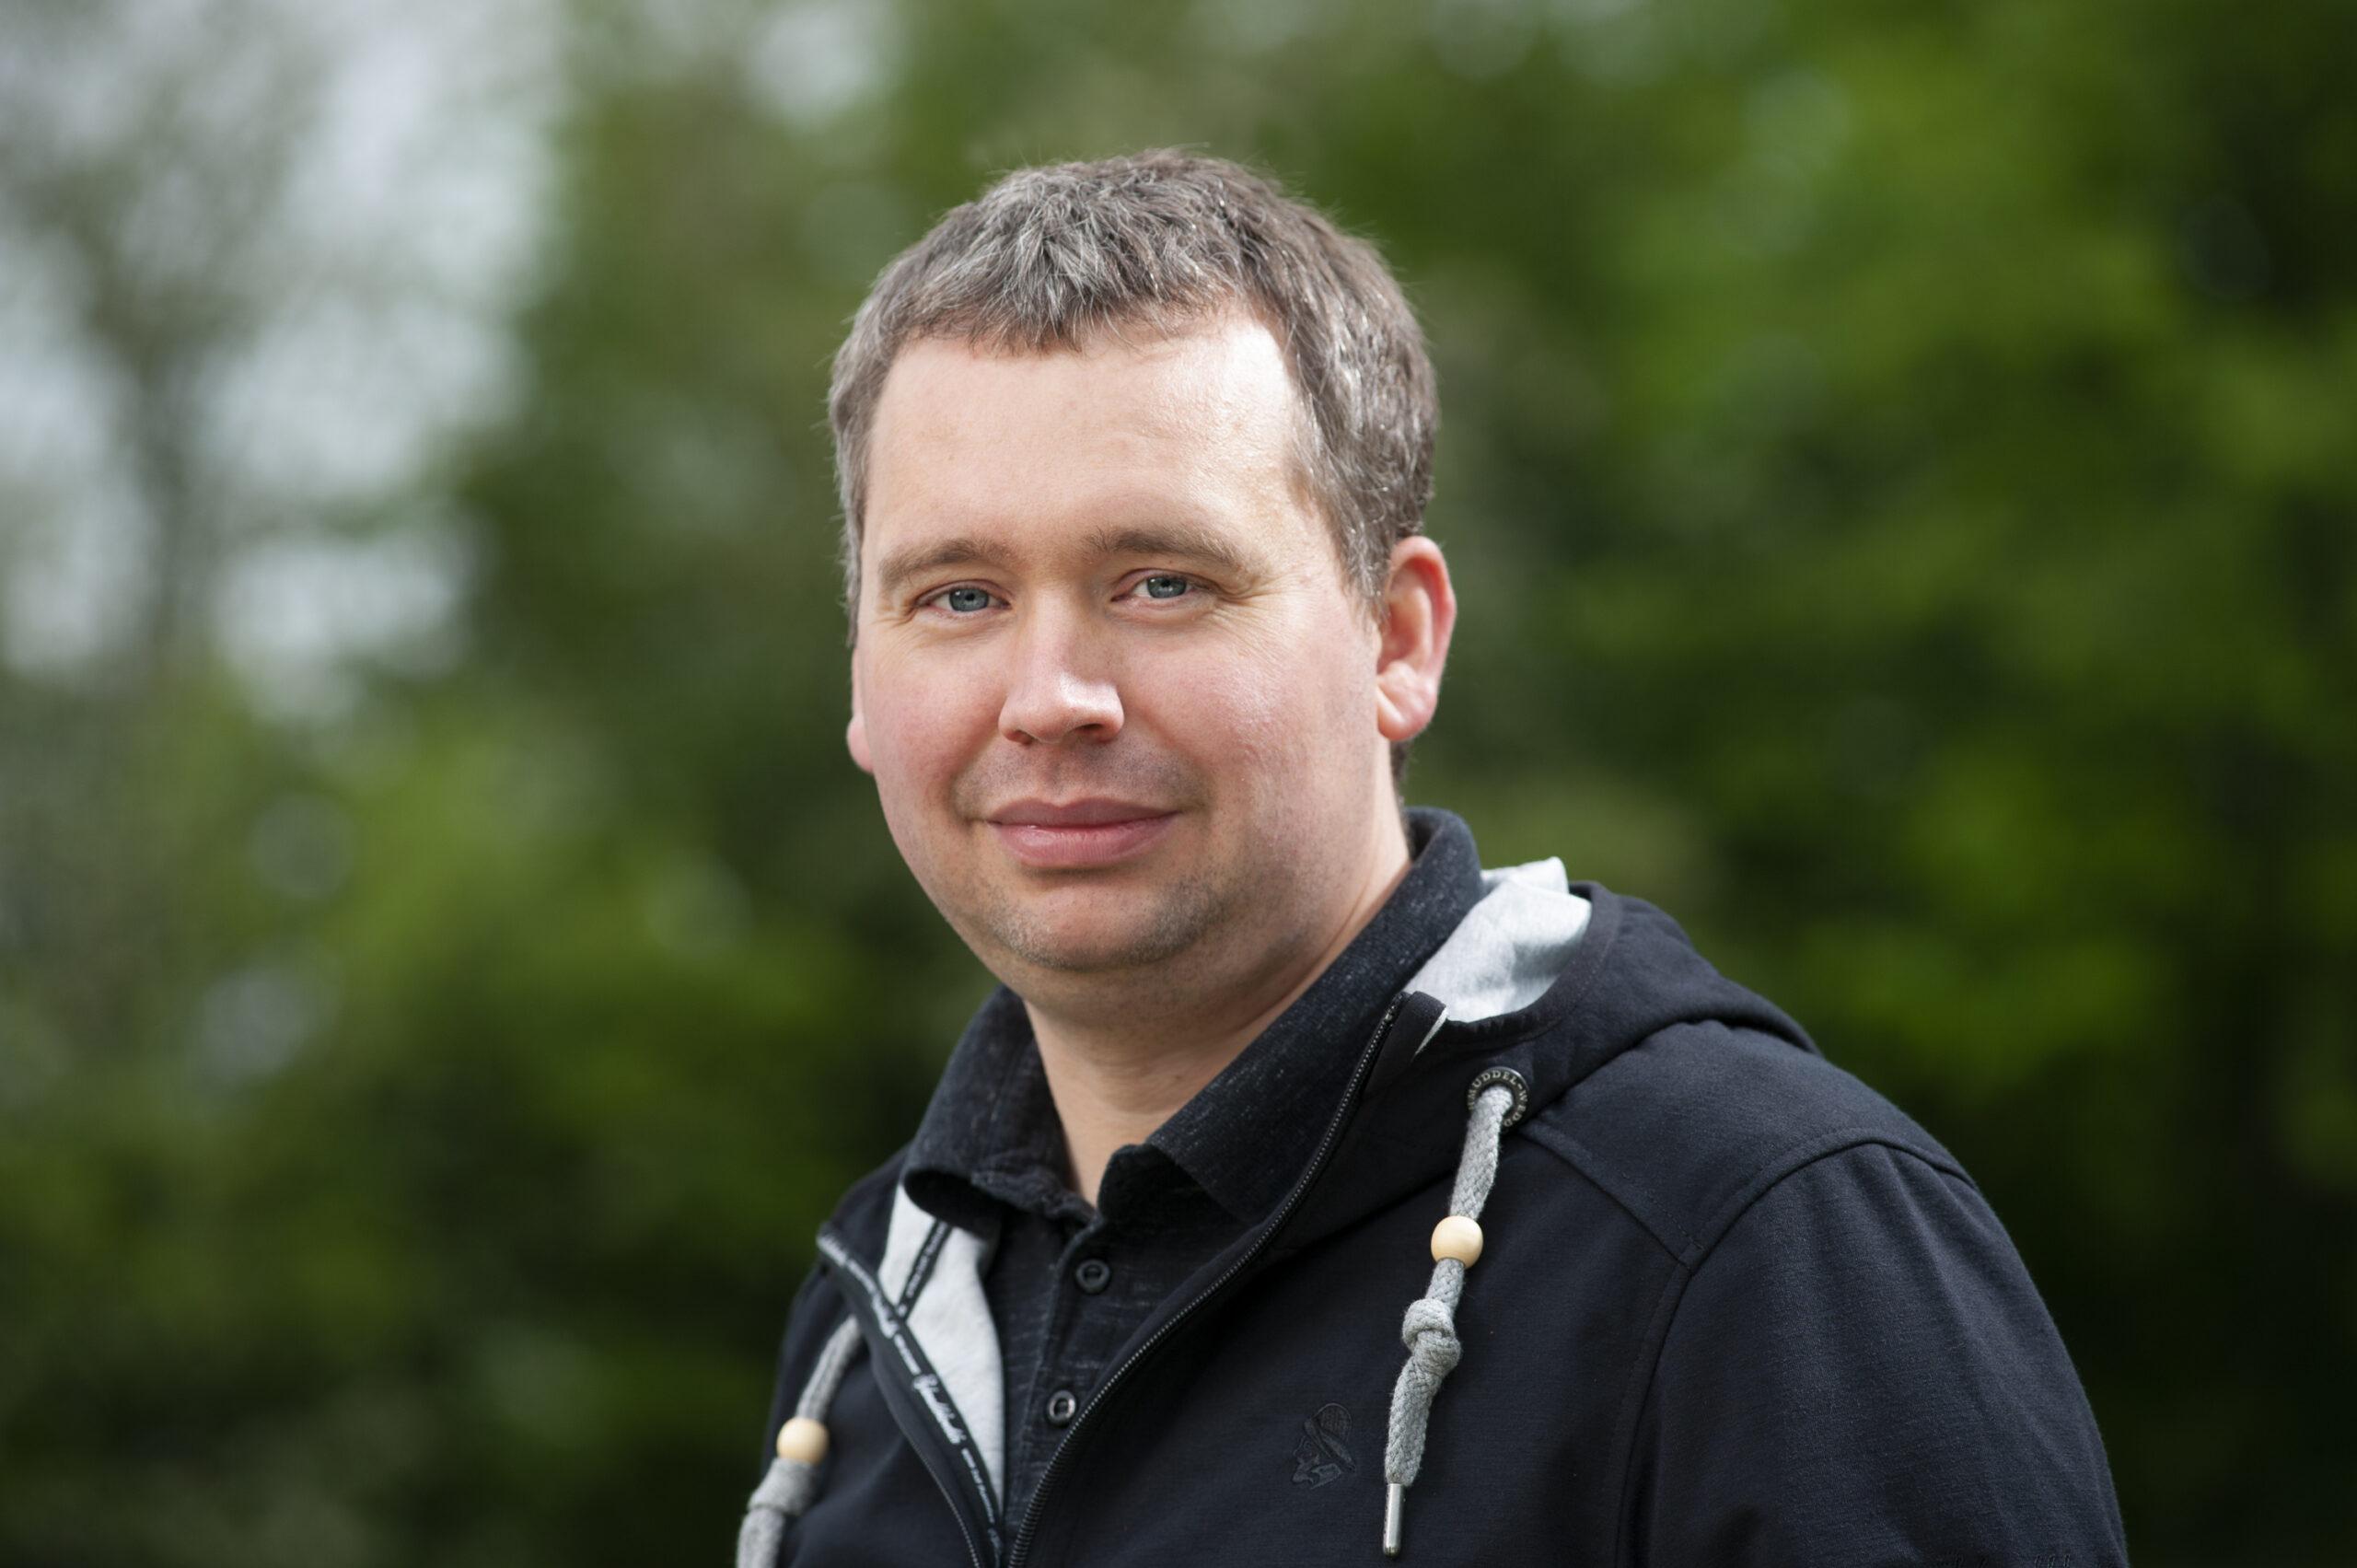 Sven Meyne